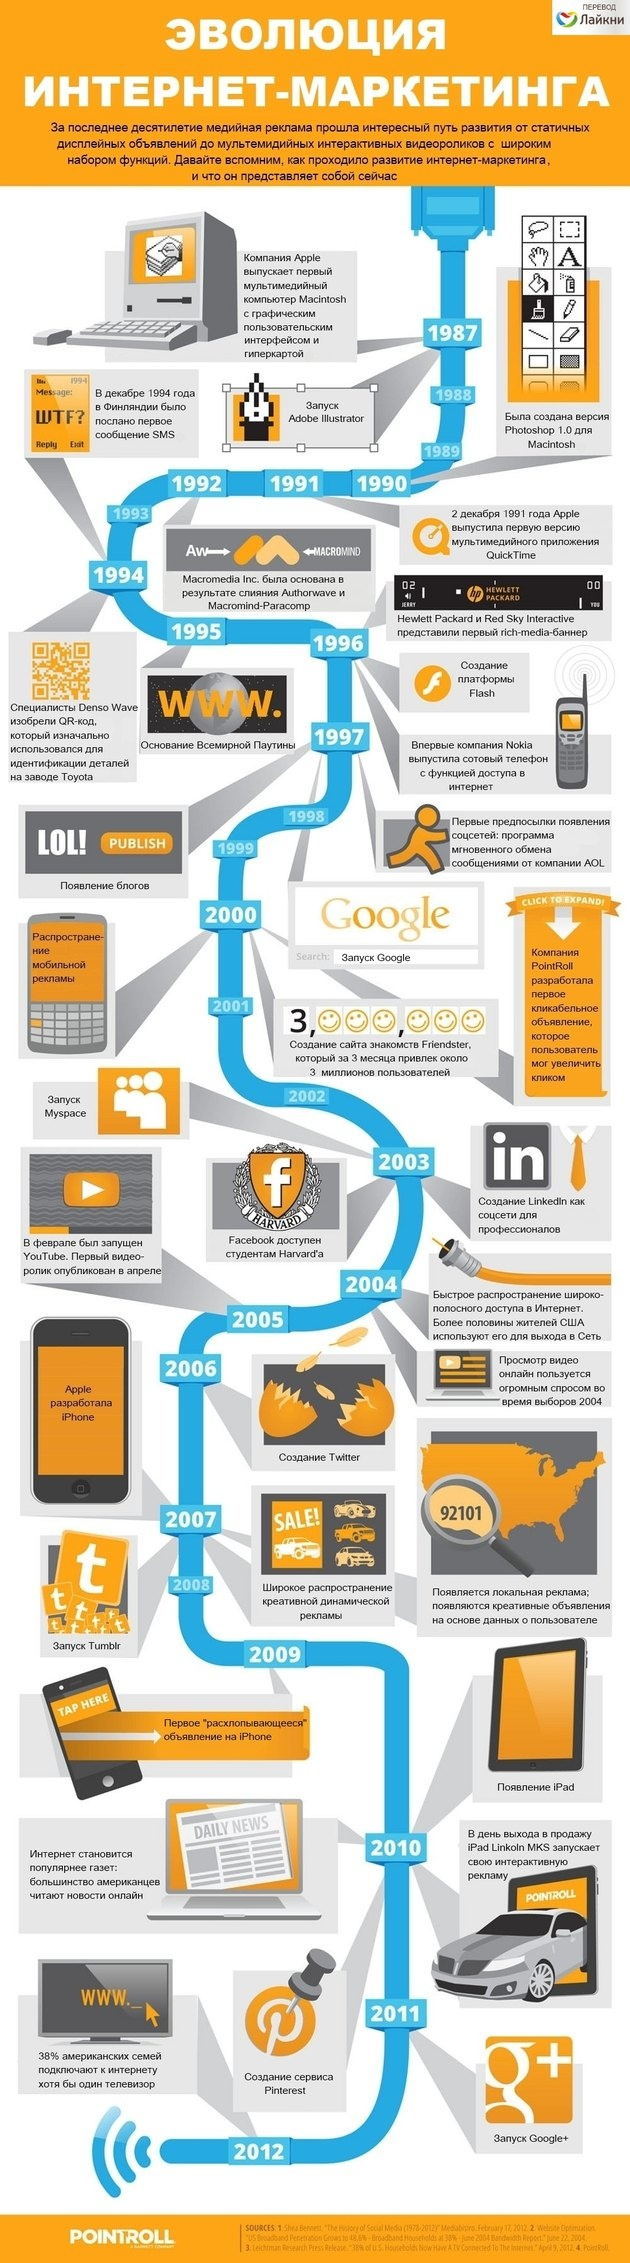 Эволюция интернет-маркетинга. Инфографика / Новости / Идеи и модели на Prostoweb.com.ua